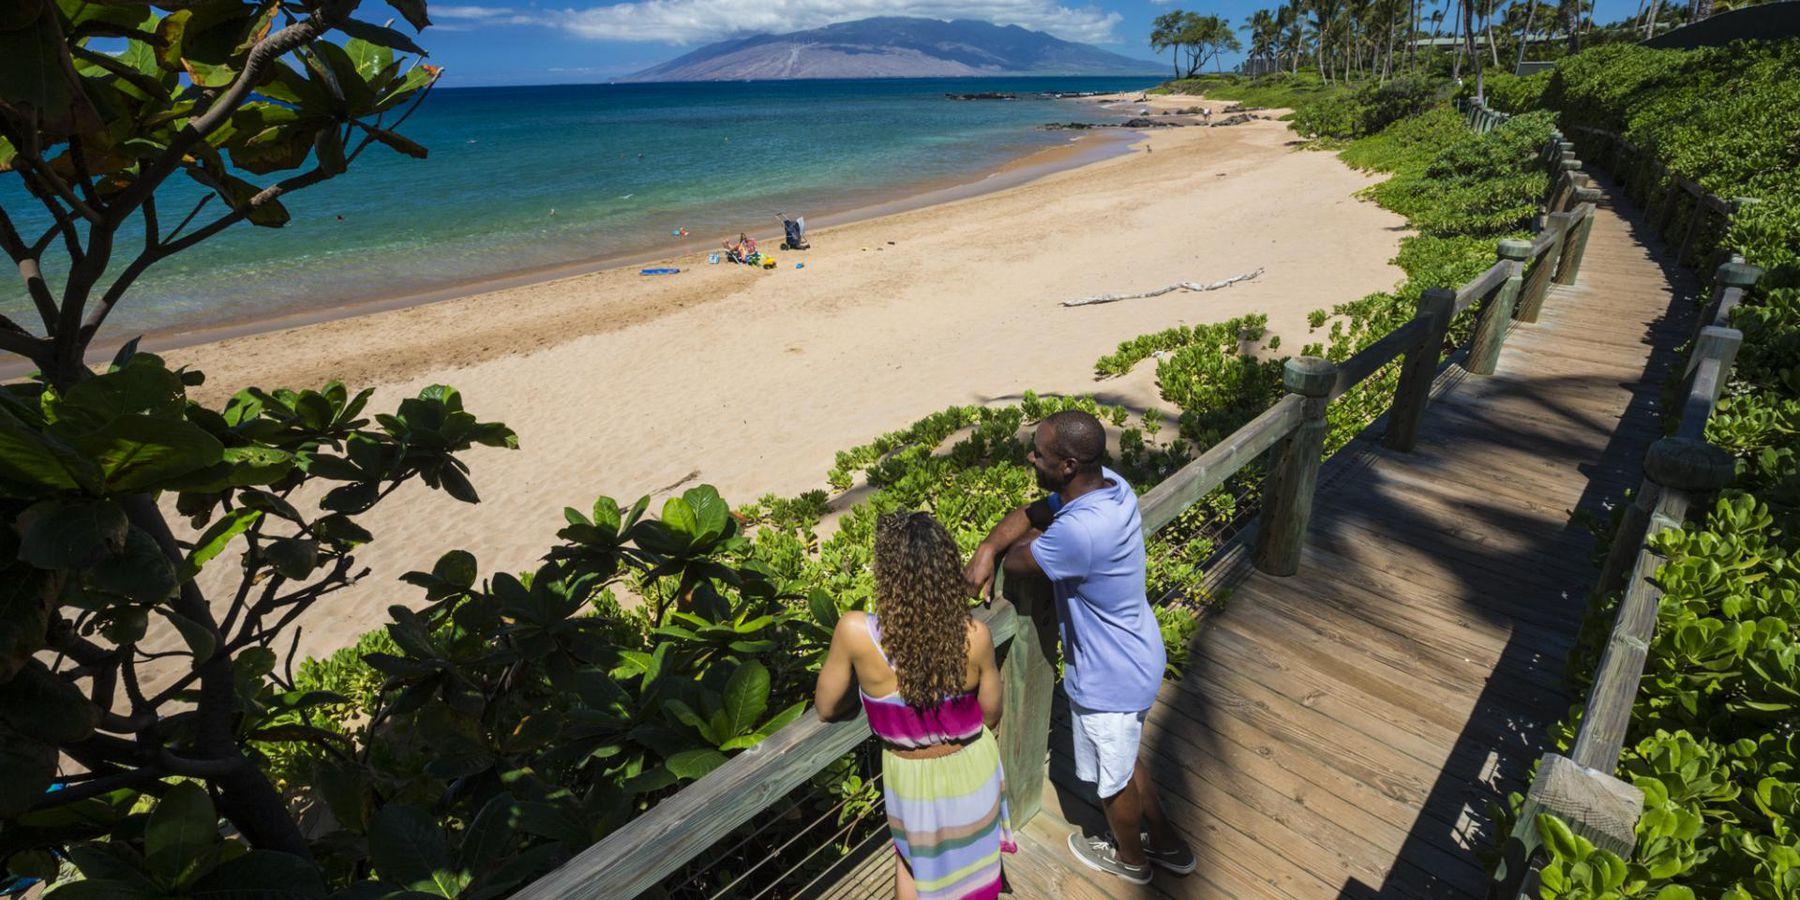 Wailea - Maui - Hawaii - Doets Reizen